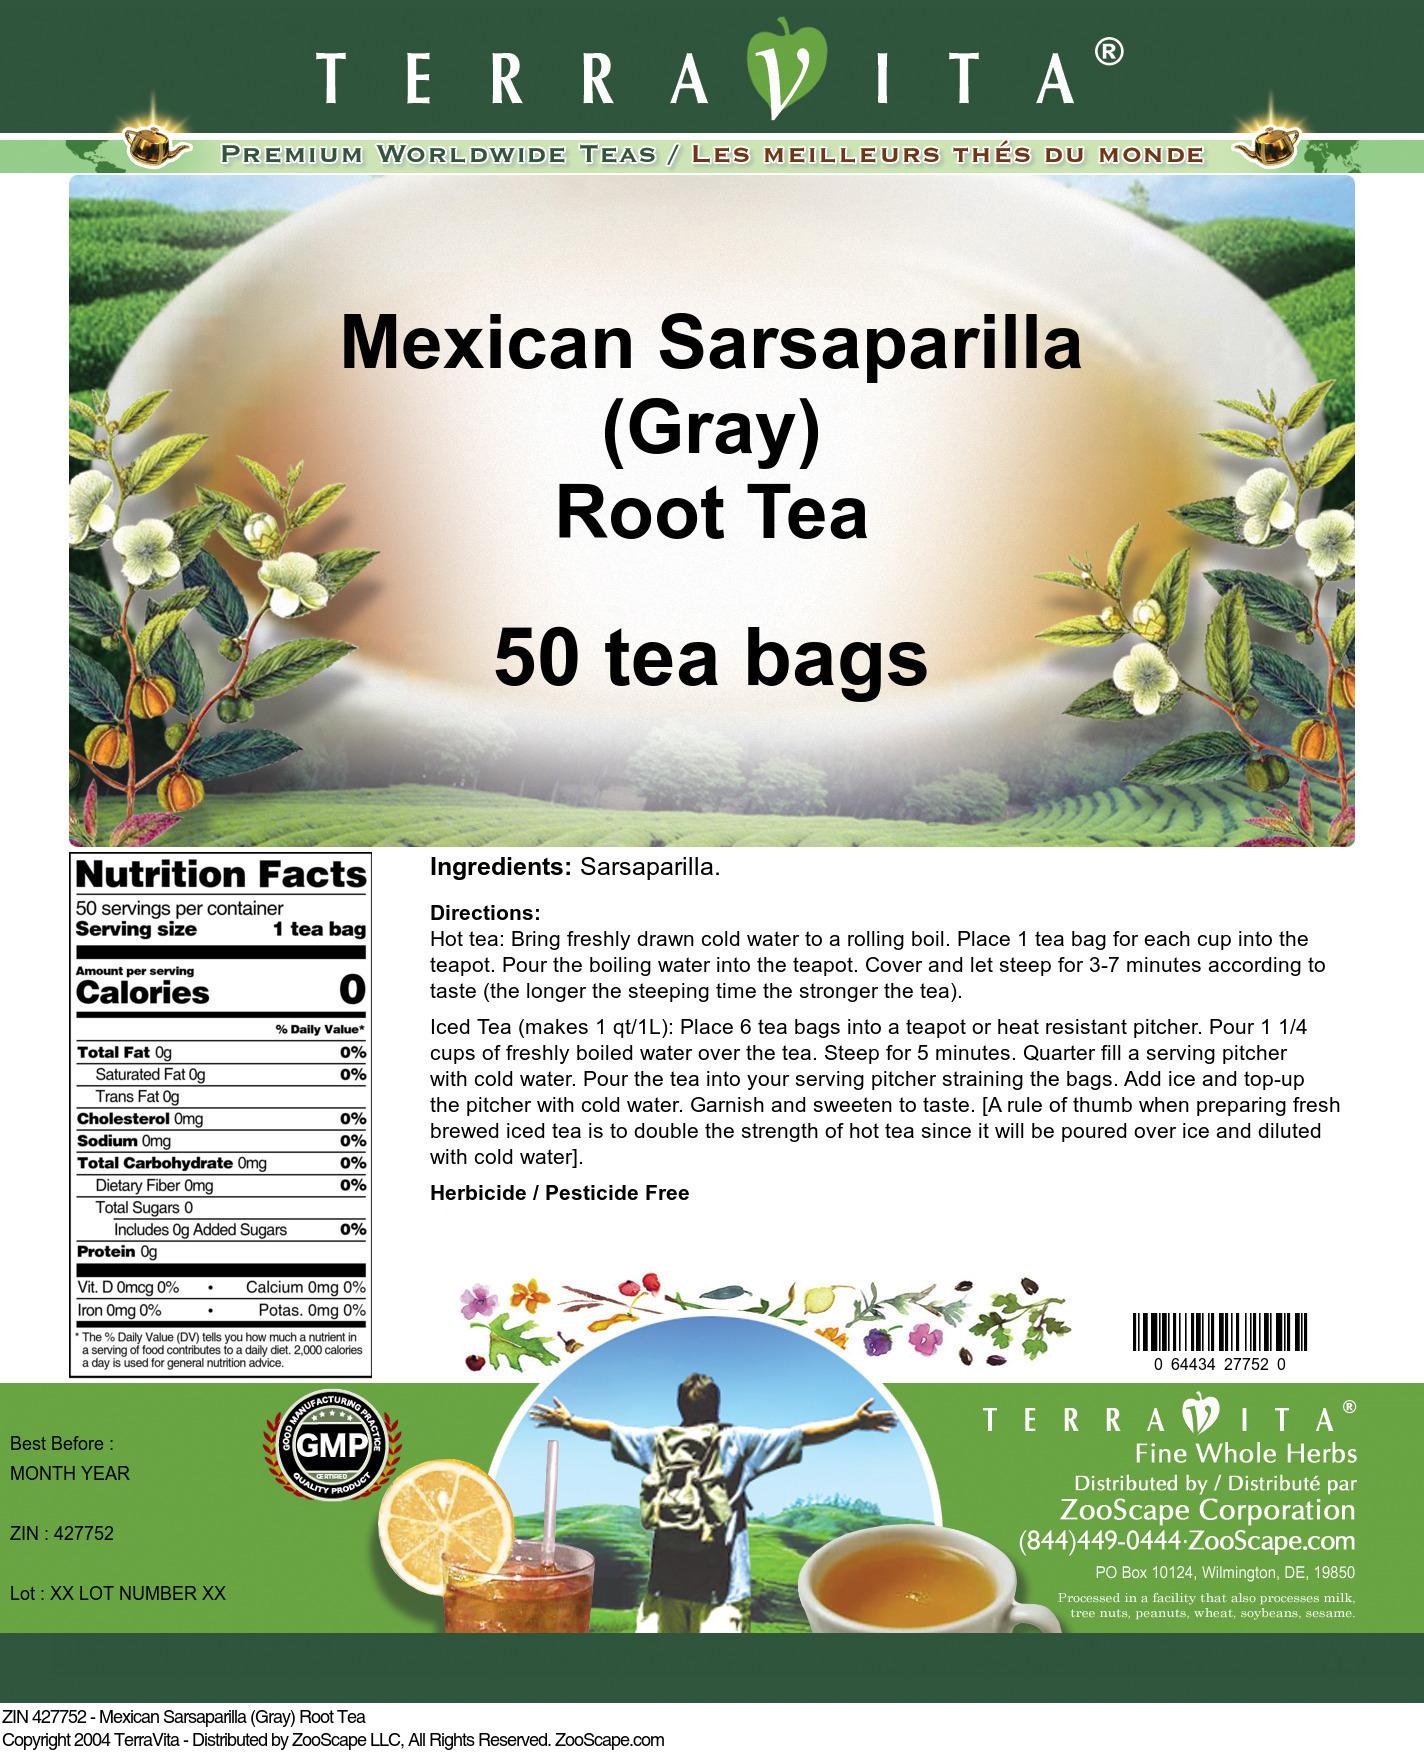 Mexican Sarsaparilla (Gray) Root Tea